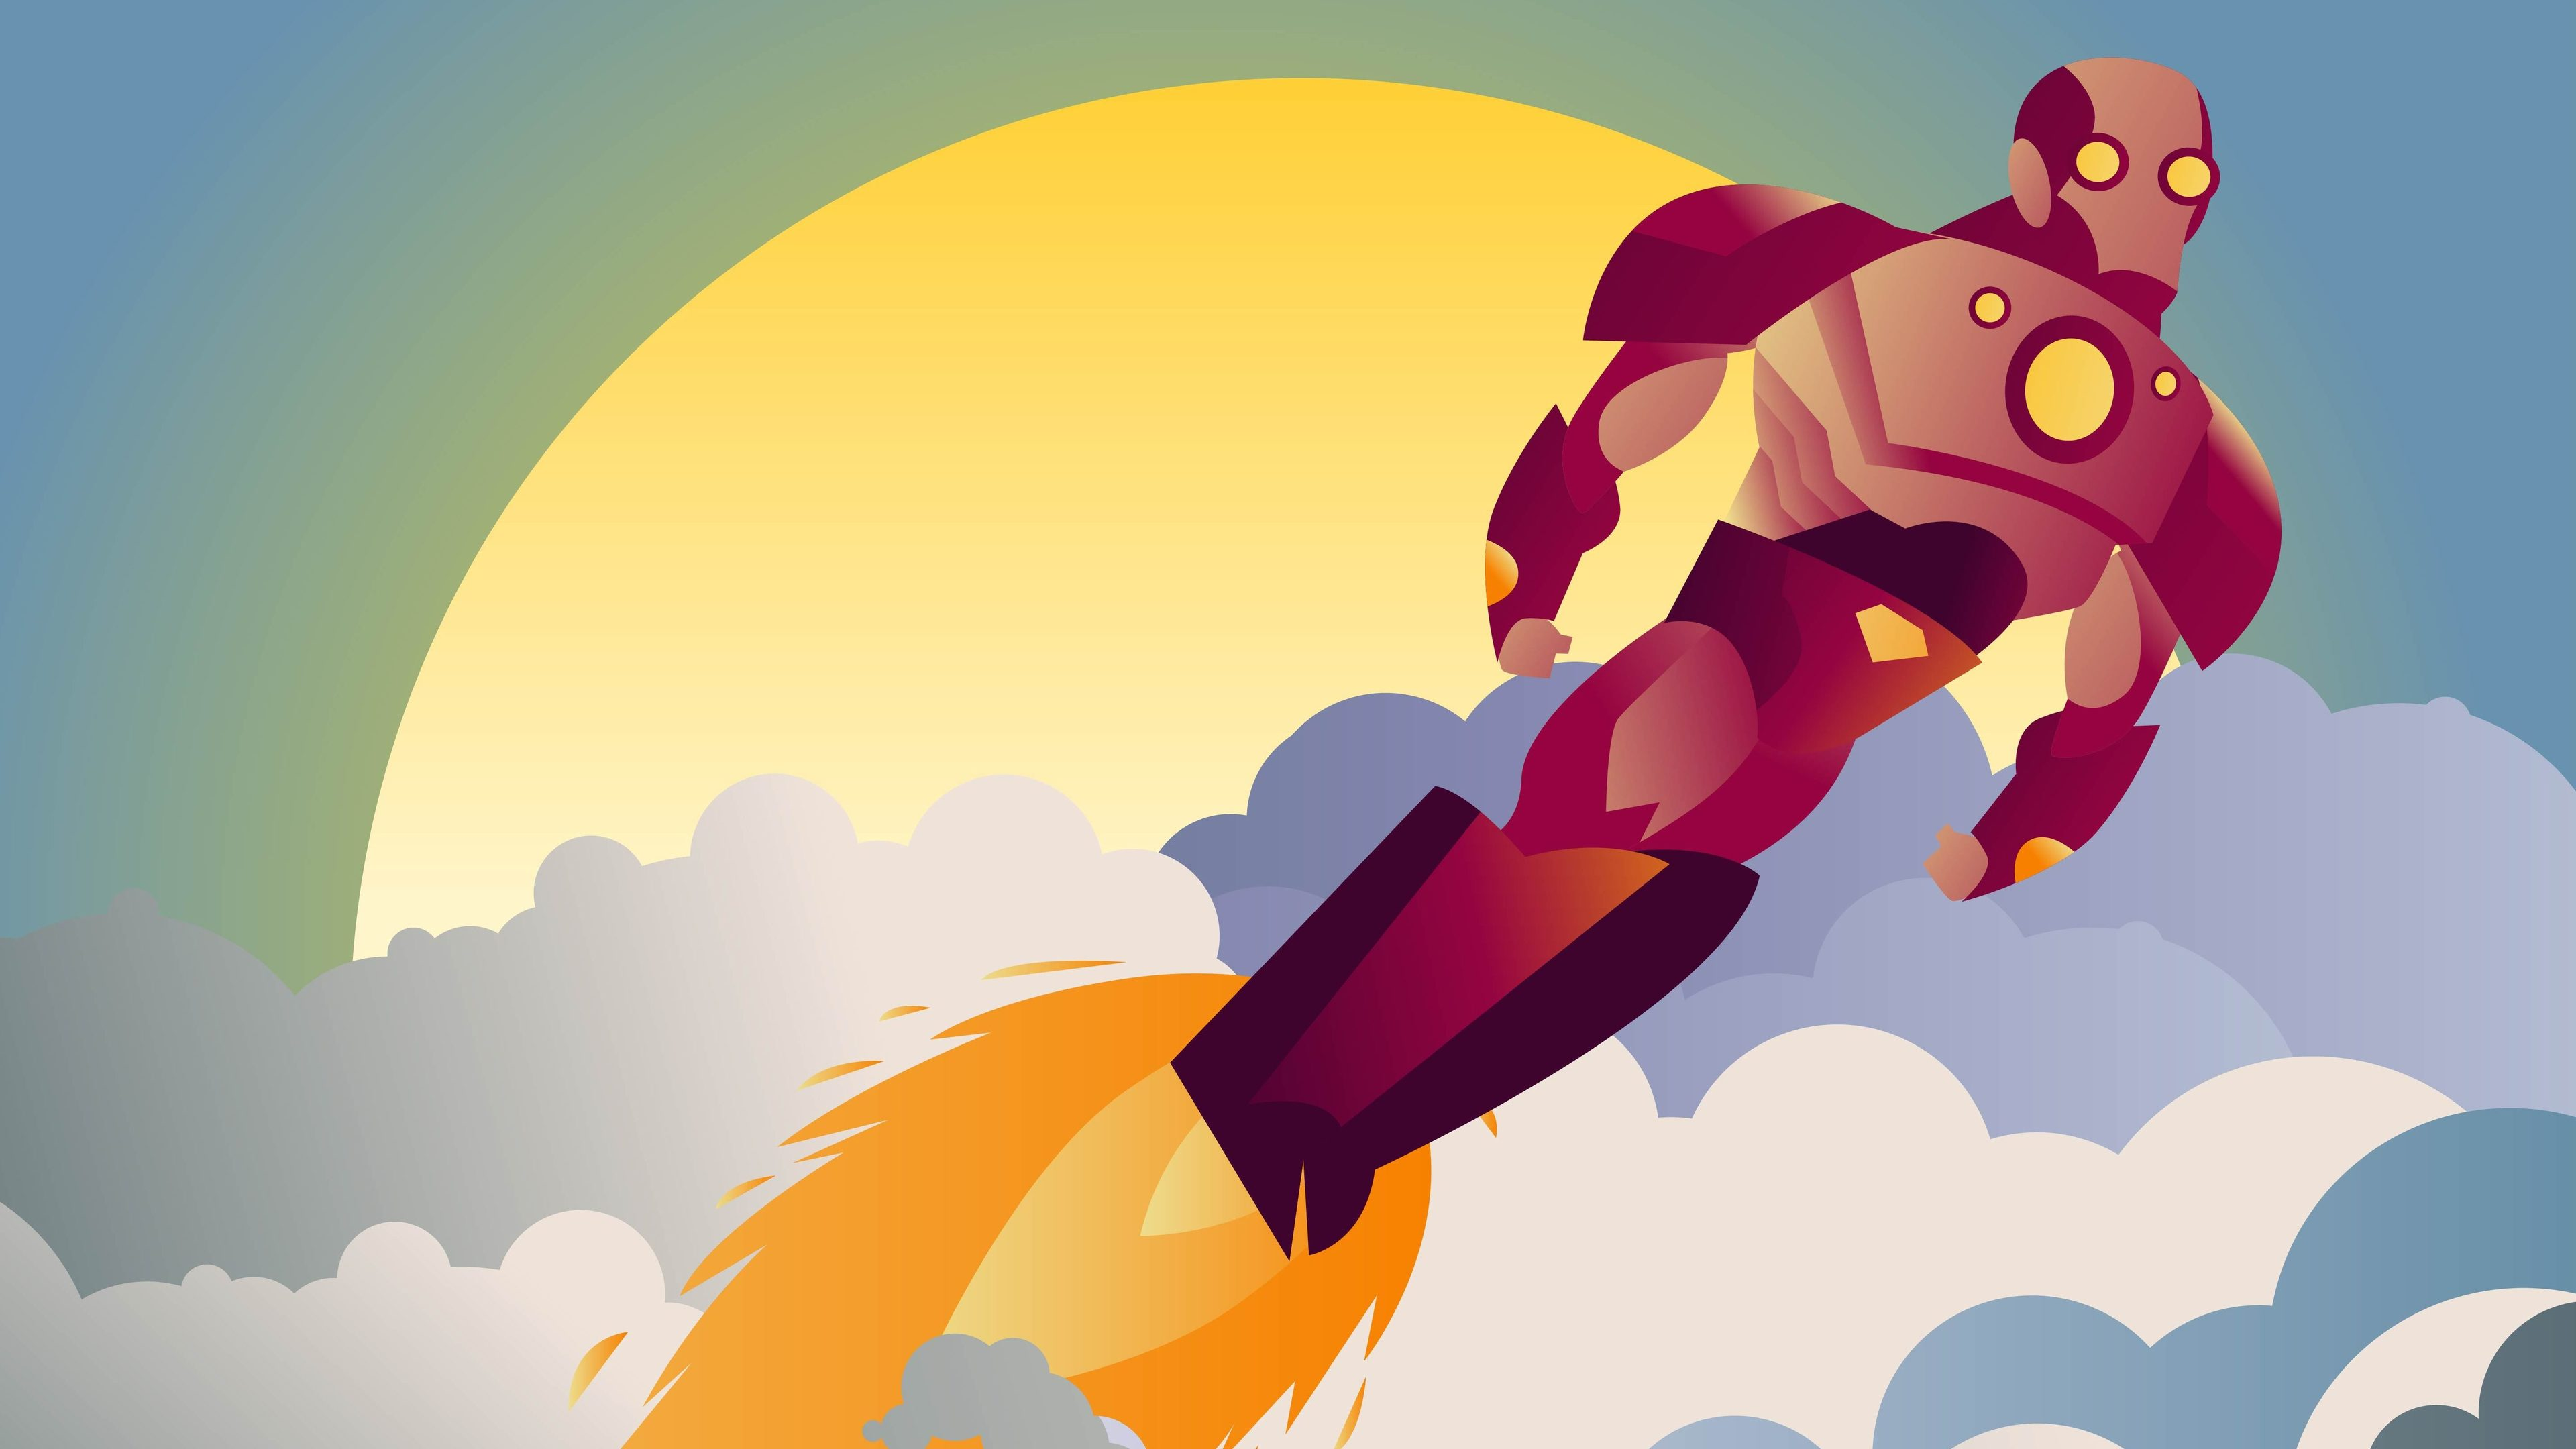 iron man sunset clouds minimalist 1536522774 - Iron Man Sunset Clouds Minimalist - superheroes wallpapers, minimalist wallpapers, minimalism wallpapers, iron man wallpapers, hd-wallpapers, 5k wallpapers, 4k-wallpapers